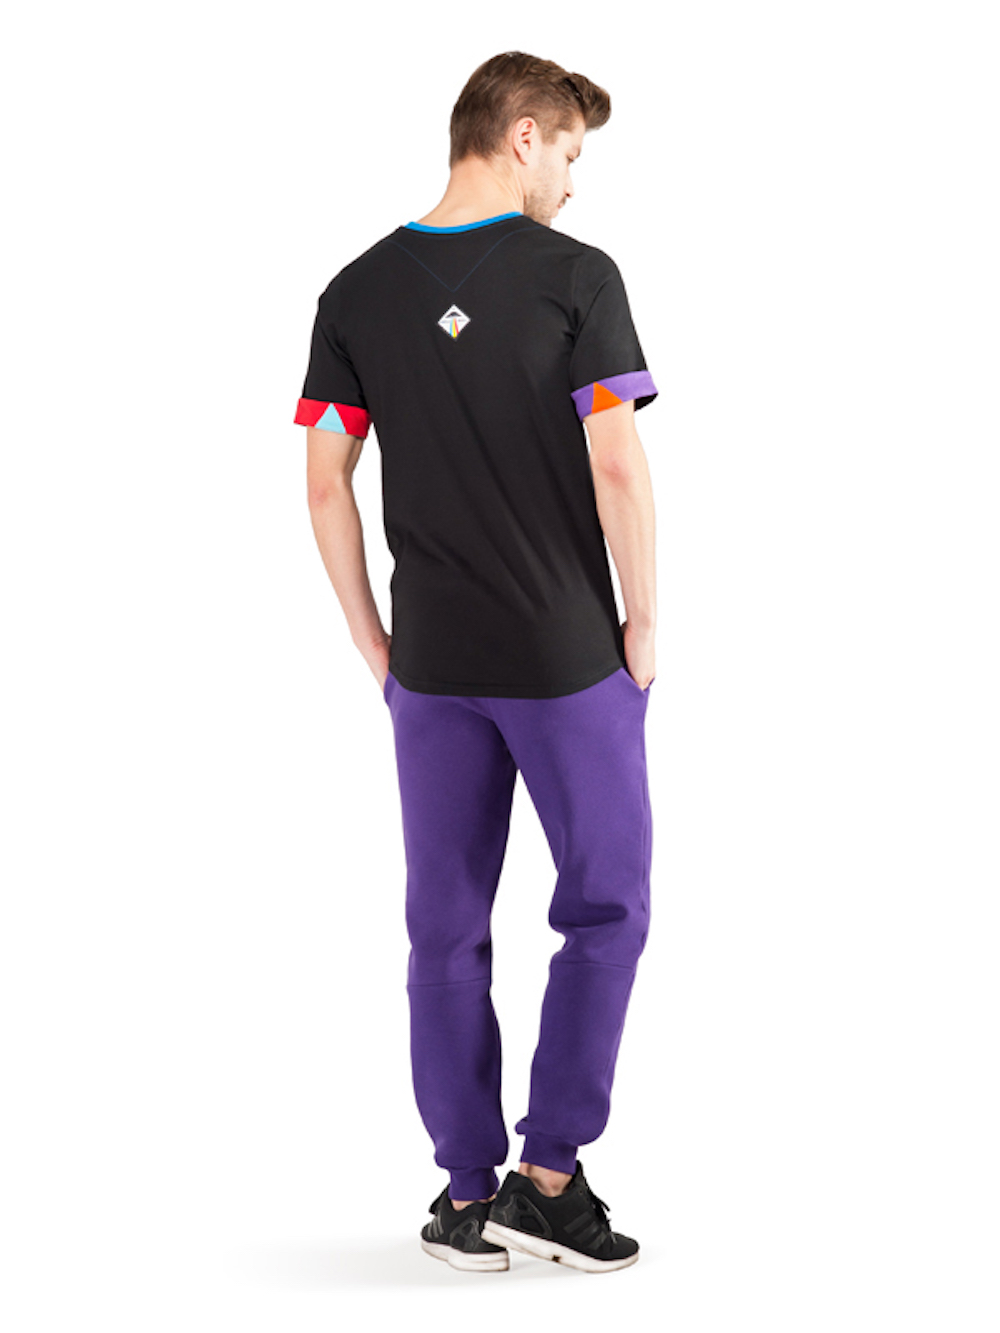 Crystal Skull Pocket T-shirt (Colour) - Okuaku